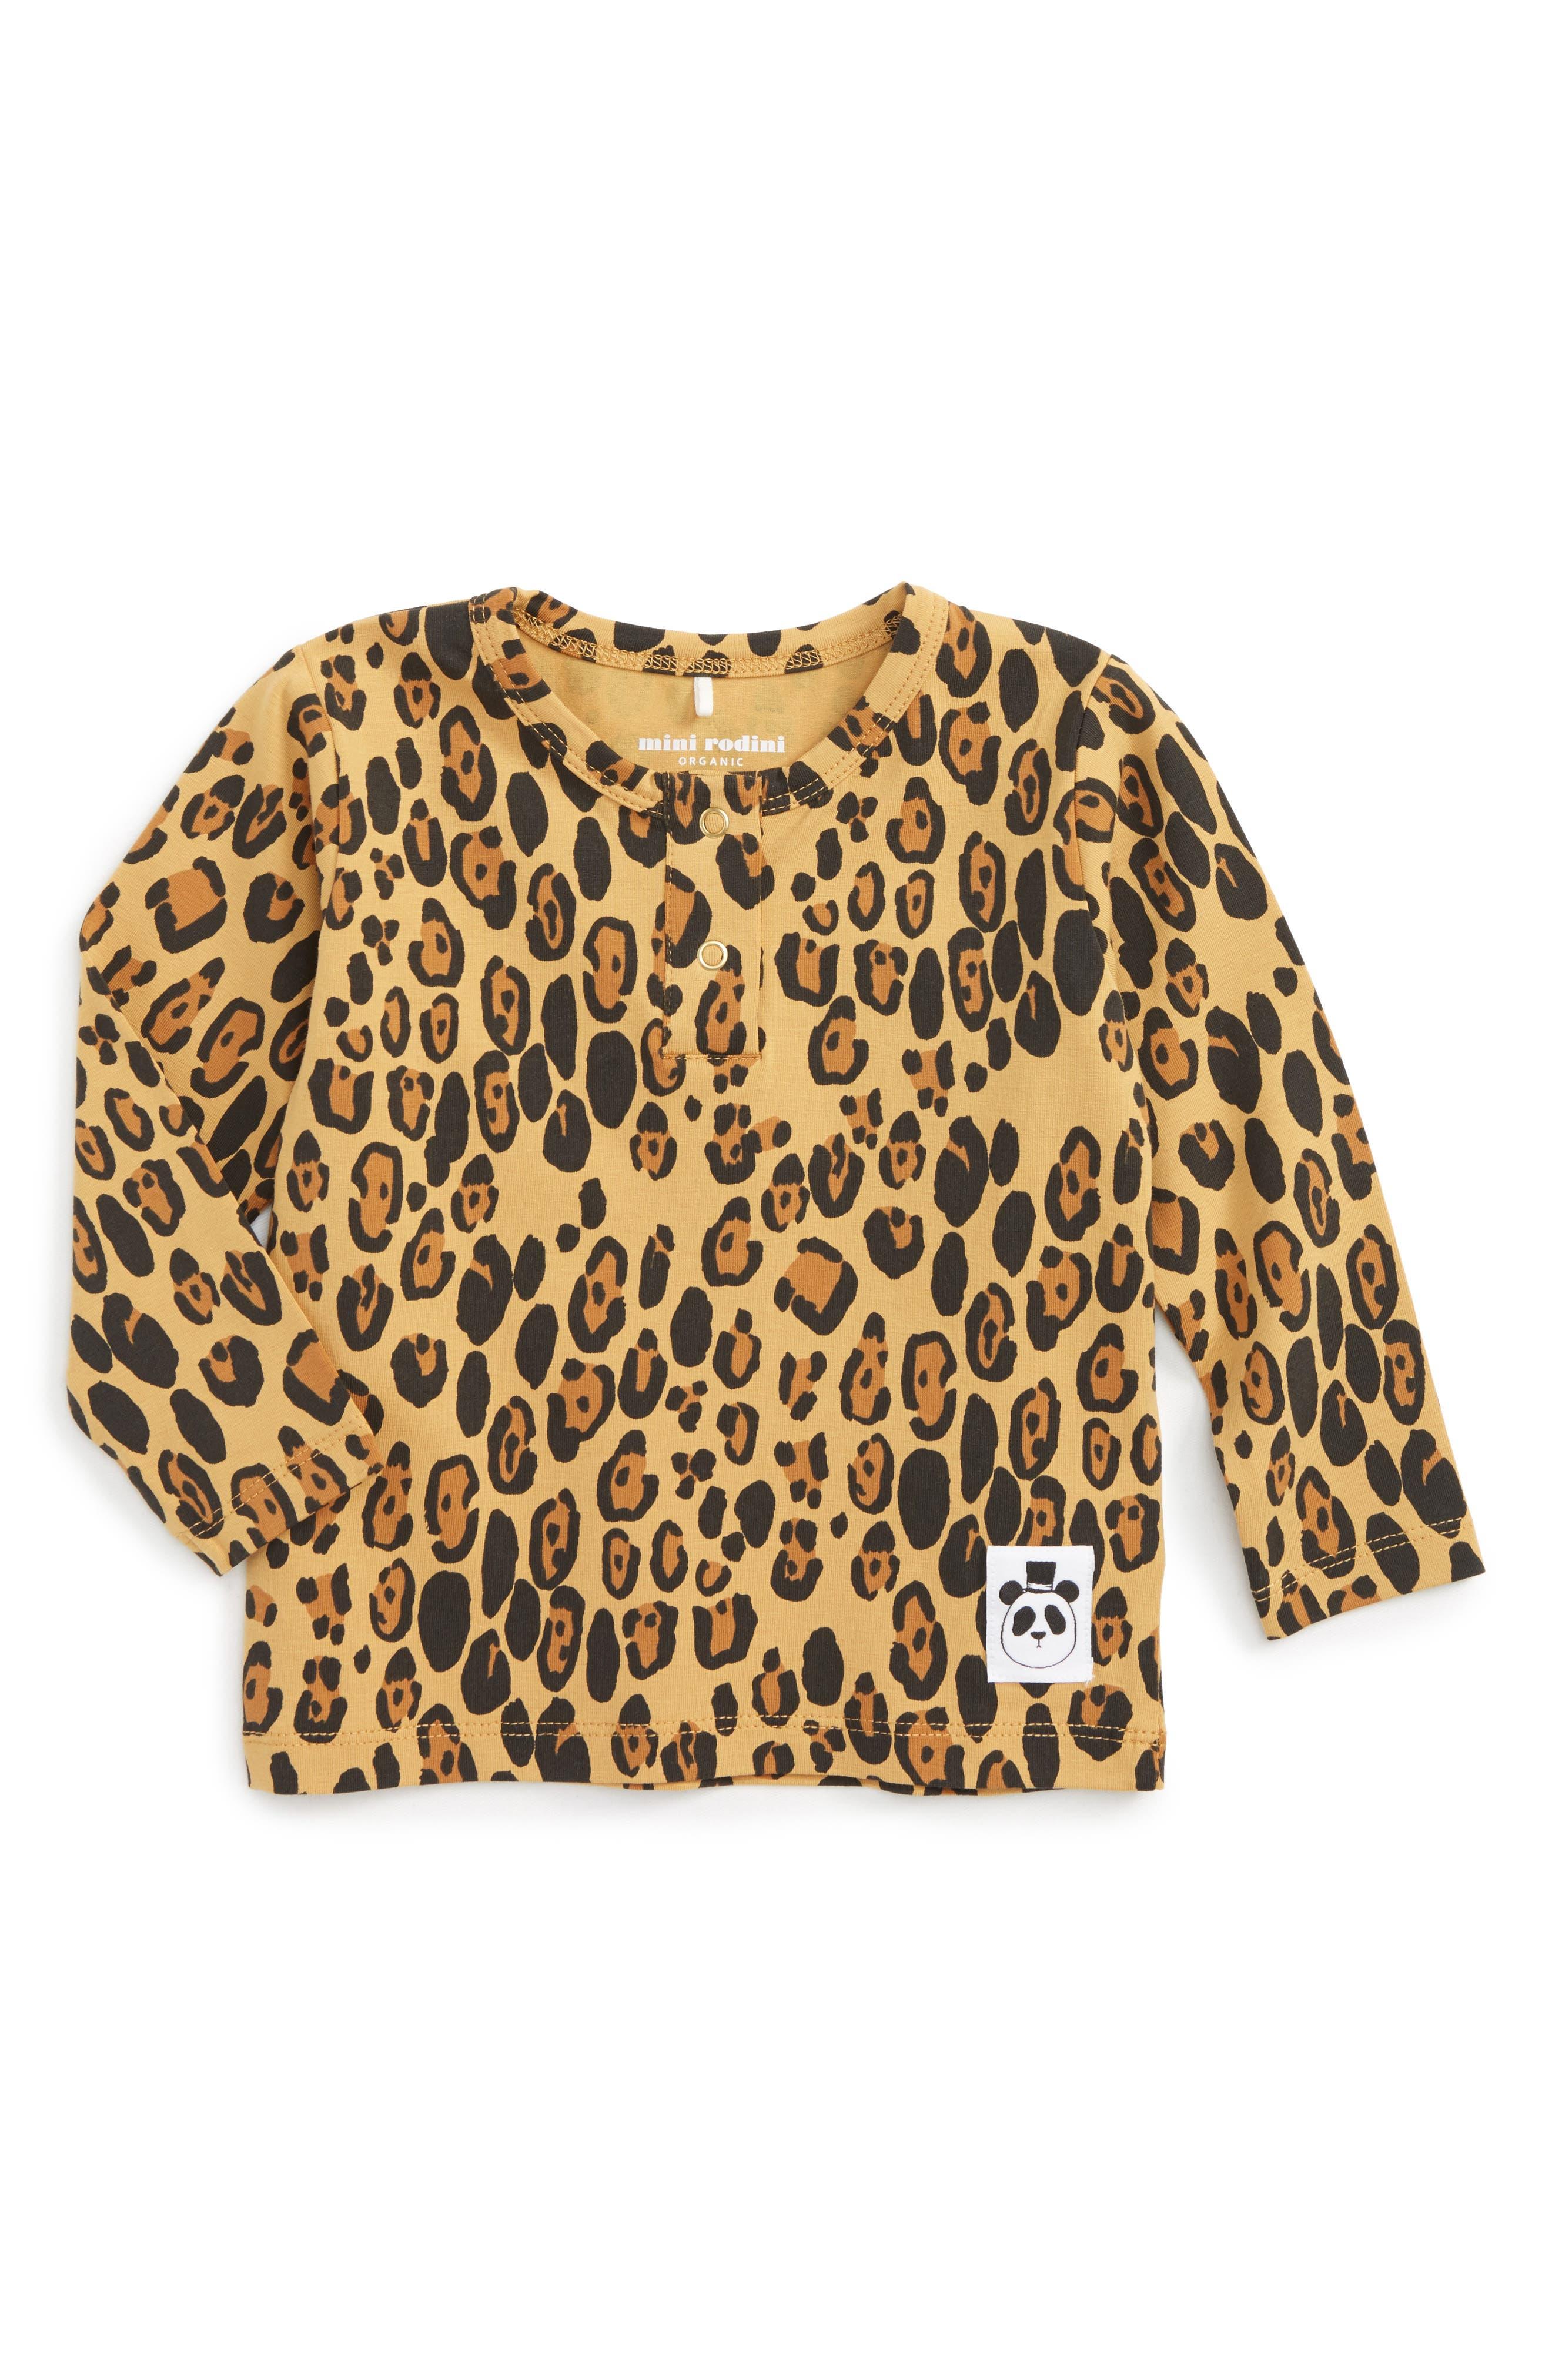 Alternate Image 1 Selected - Mini Rodini Leopard T-Shirt (Baby Boys)